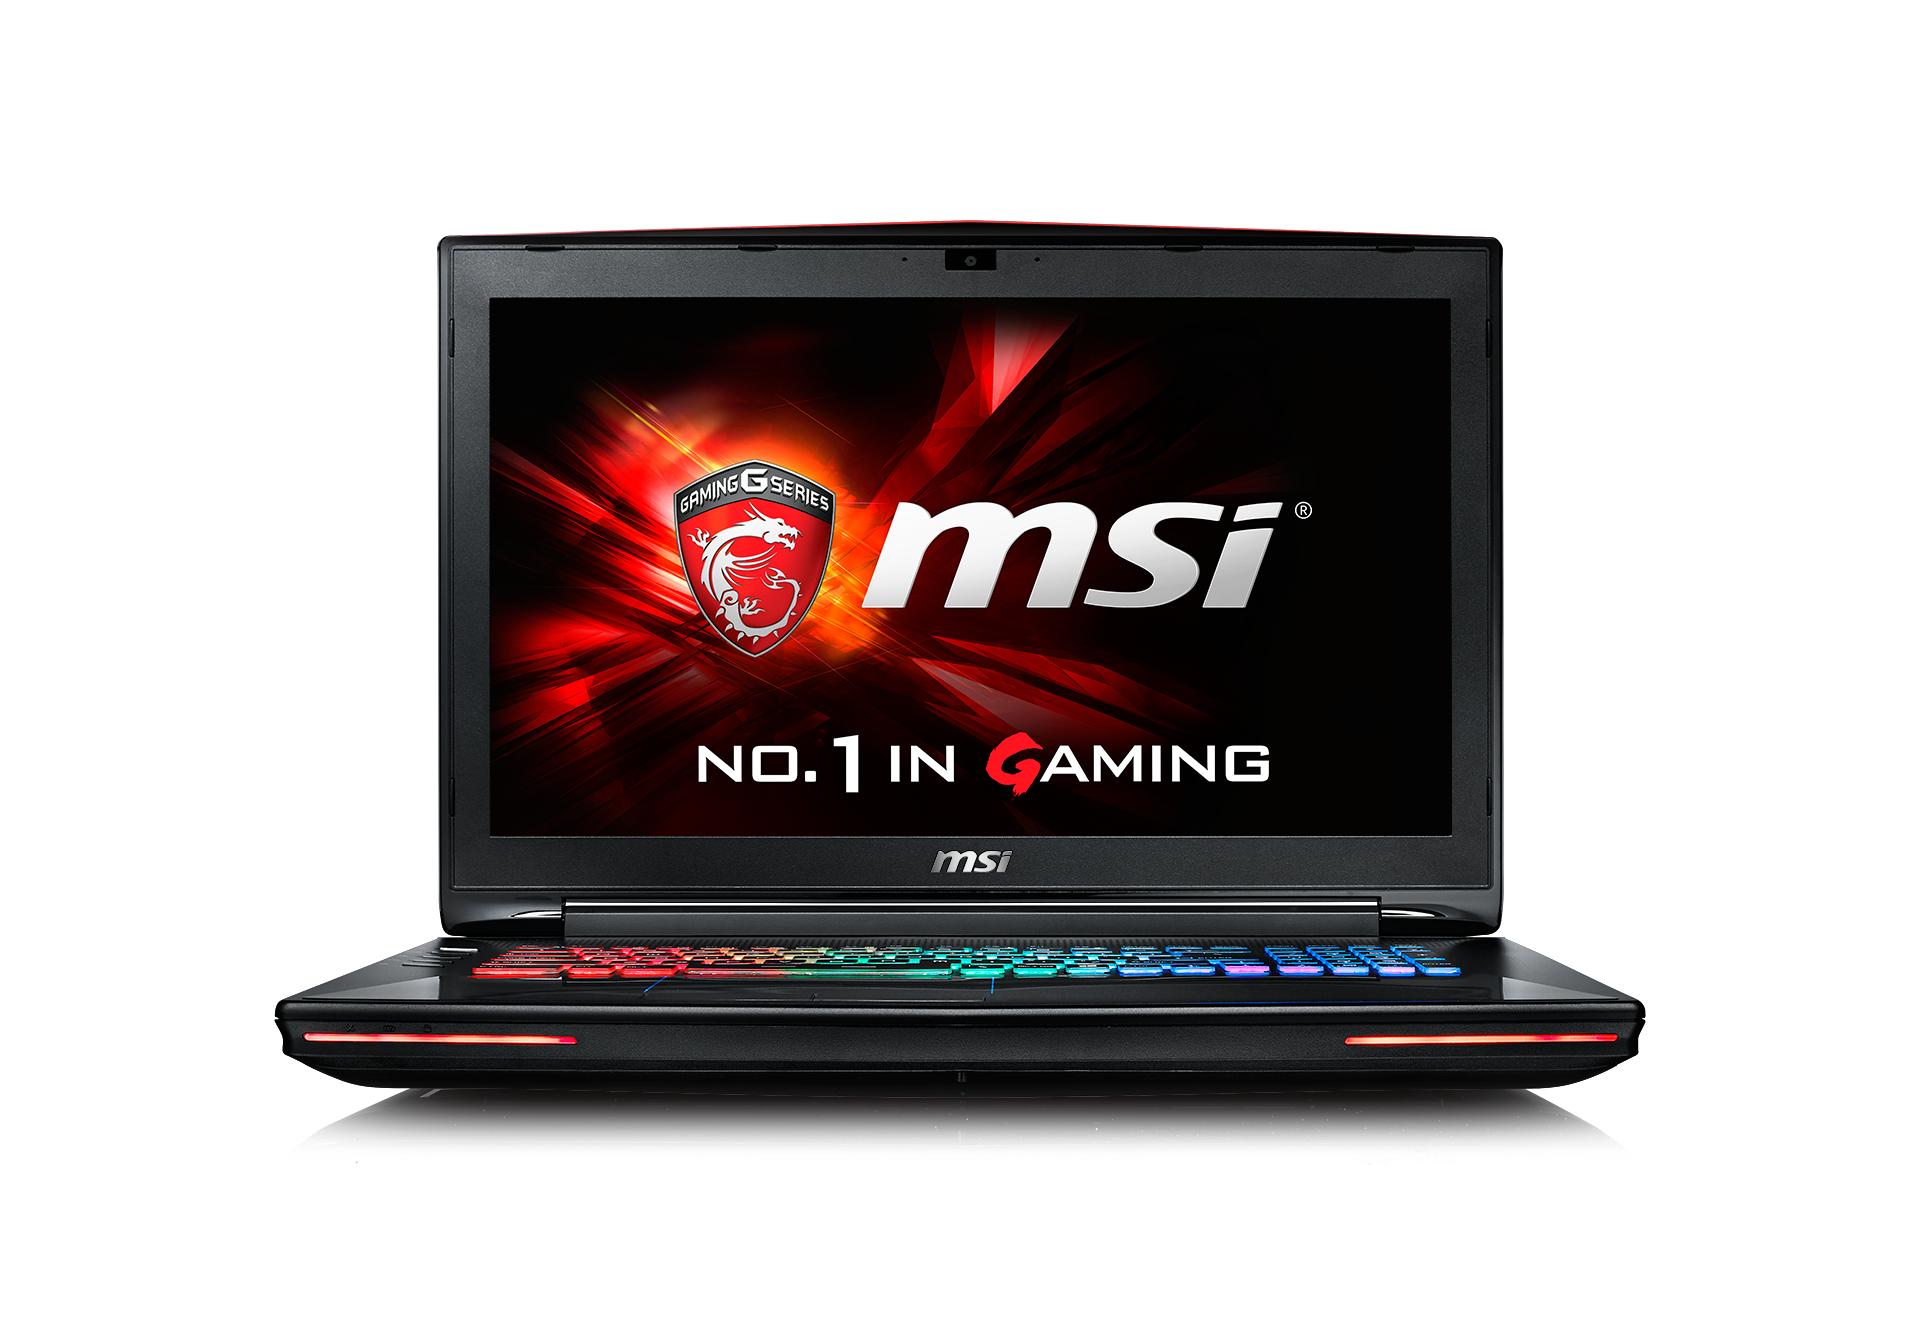 "MSI Gaming GT72S 6QE(Dominator Pro G)-265UK 2.6GHz i7-6700HQ 17.3"" 1920 x 1080pixels Black"